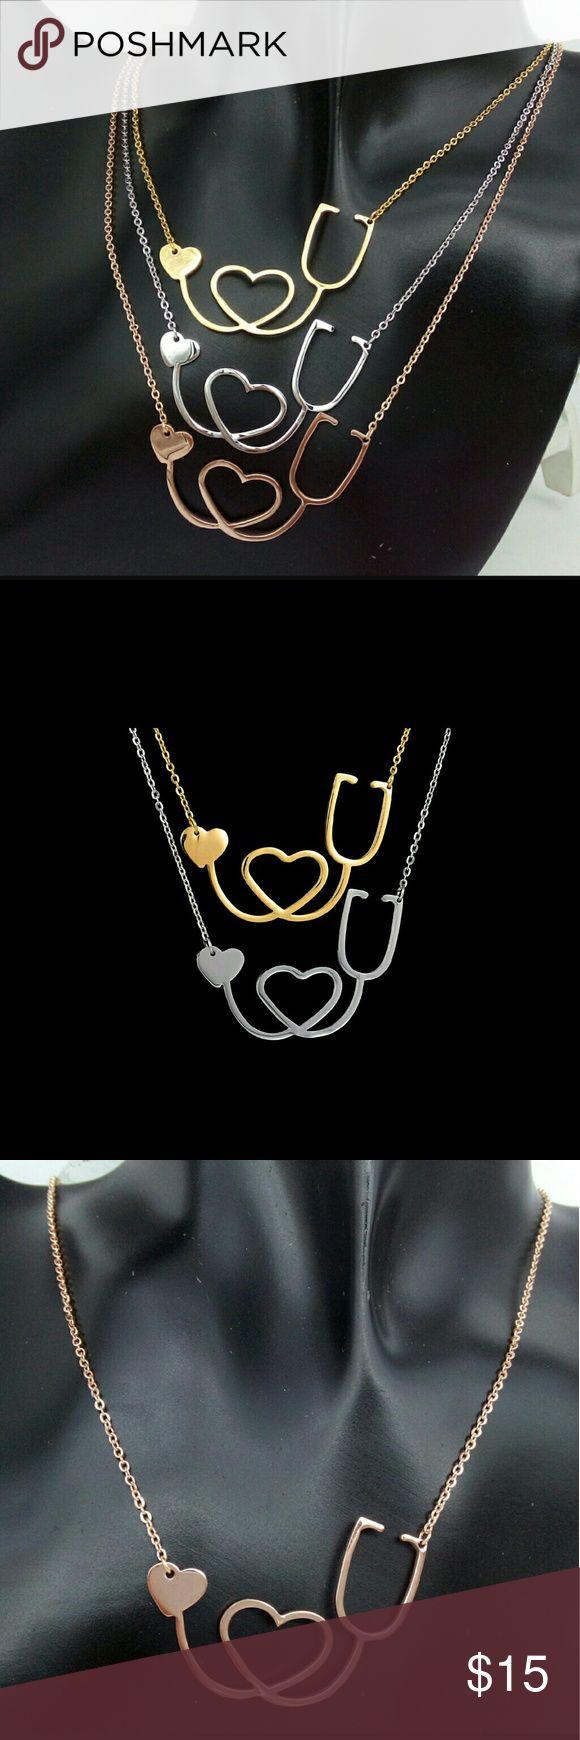 Best 25+ Stethoscope for sale ideas on Pinterest | Best ...